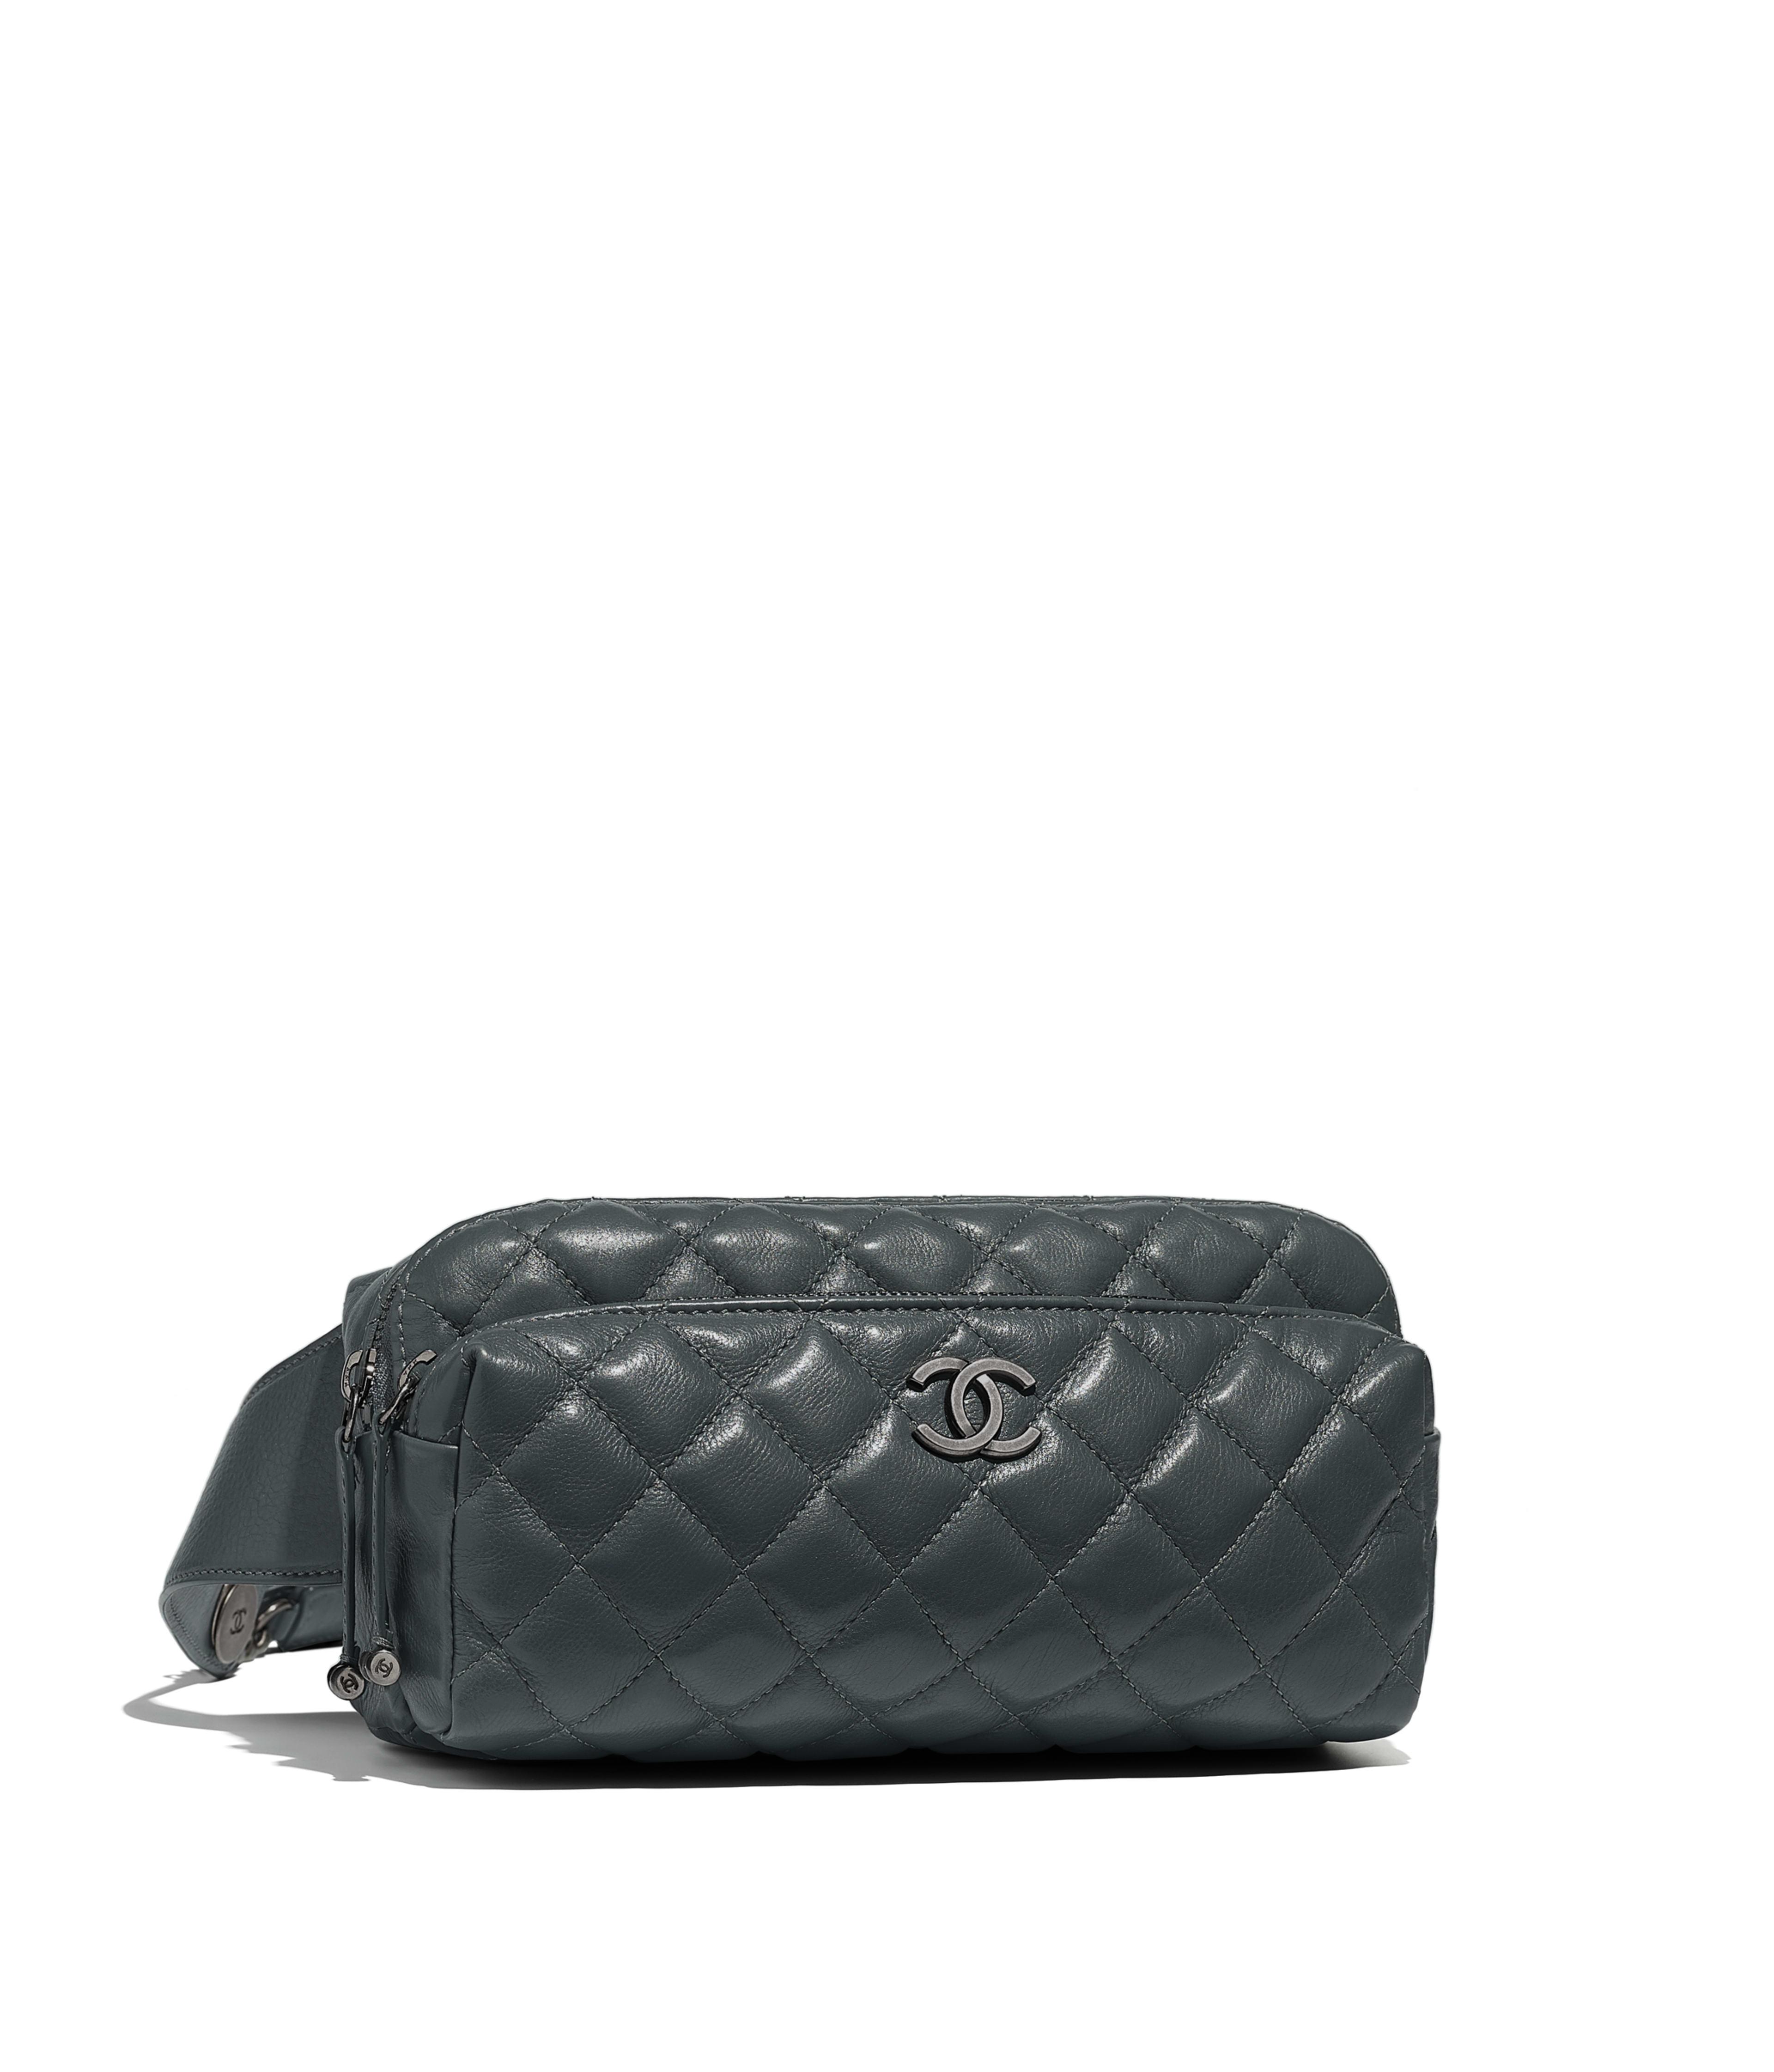 Waist Bag Calfskin Ruthenium Finish Metal Gray Ref A57887y838565b312